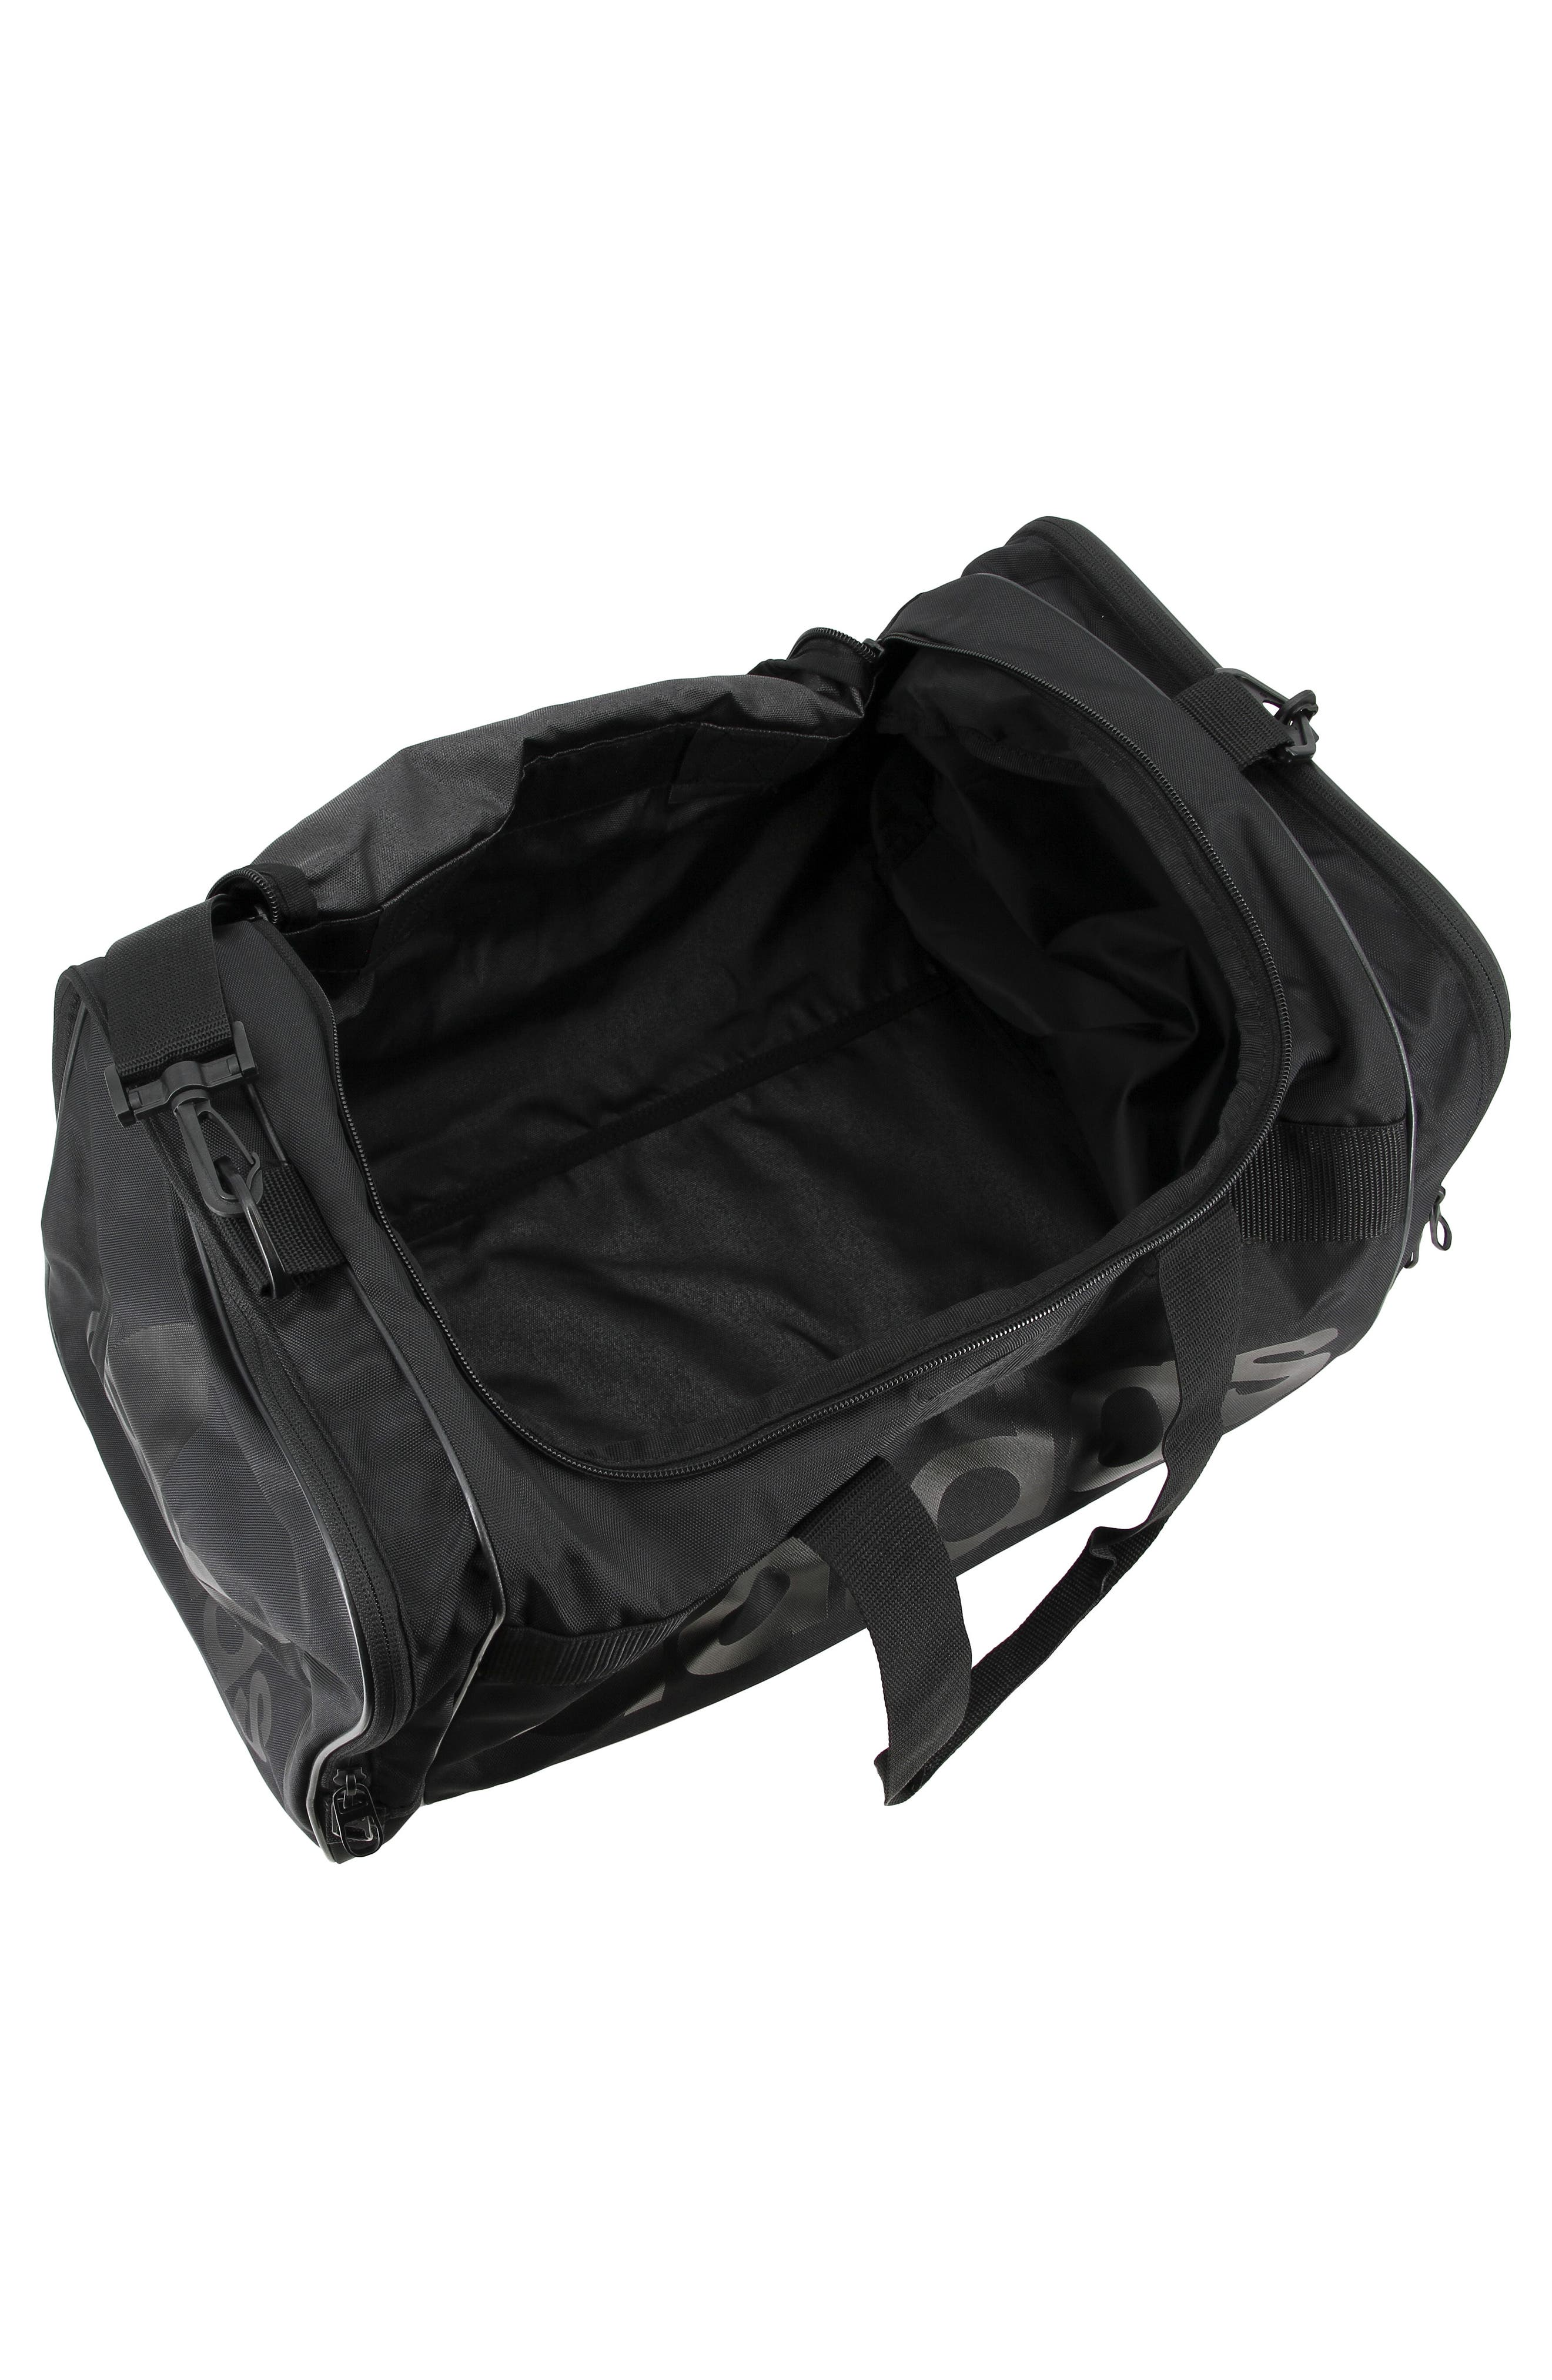 Santiago Duffel Bag,                             Alternate thumbnail 4, color,                             BLACK/ BLACK